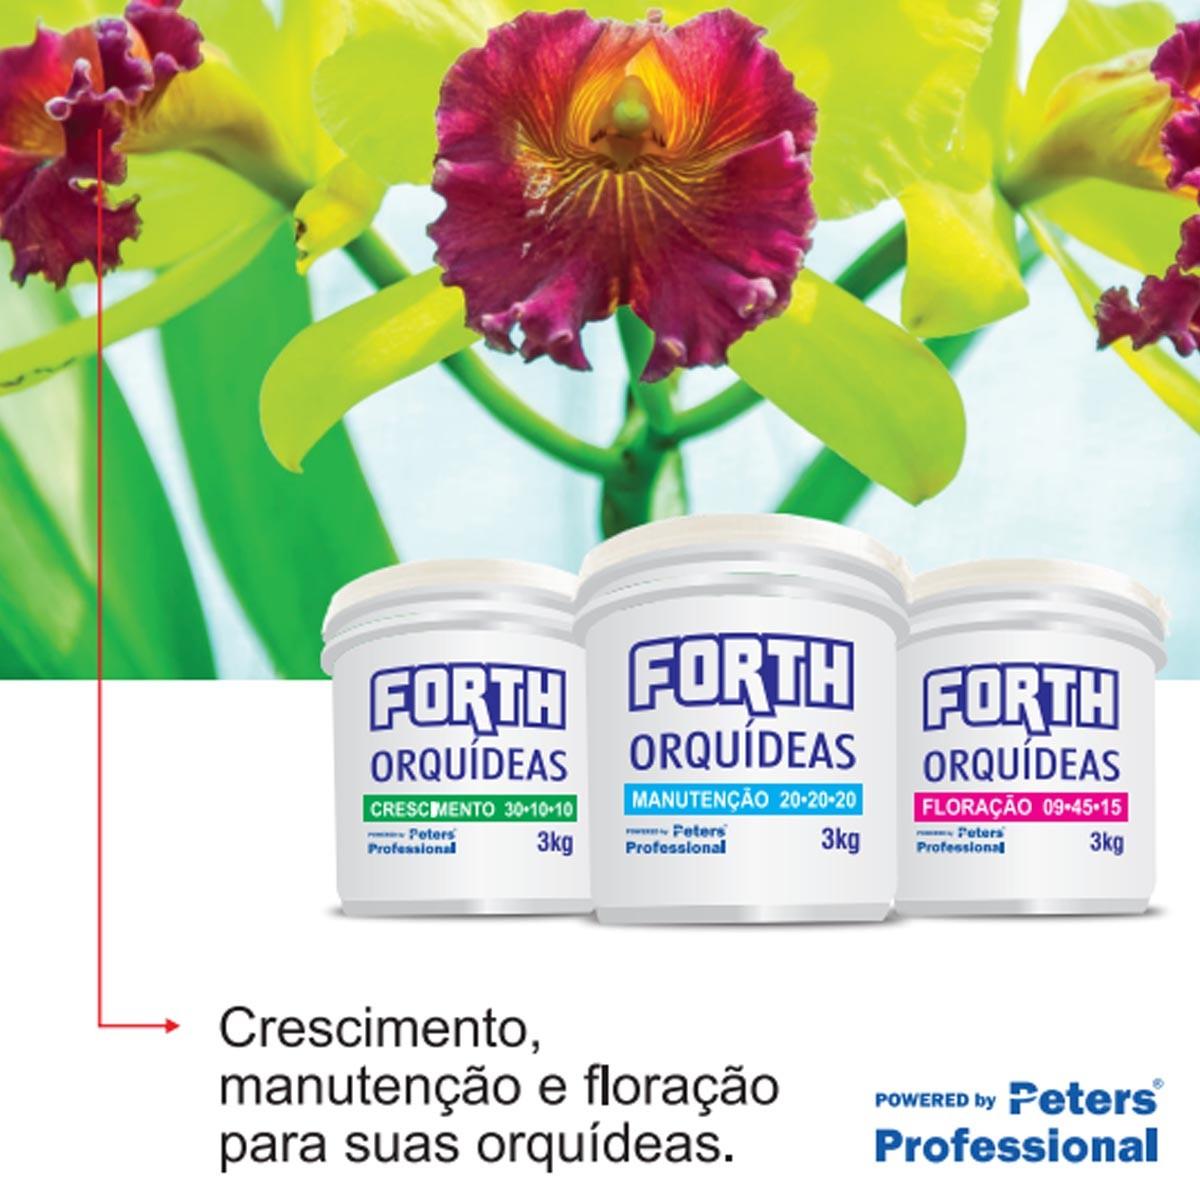 Adubo Fertilizante Forth Orquídea Floração 400g